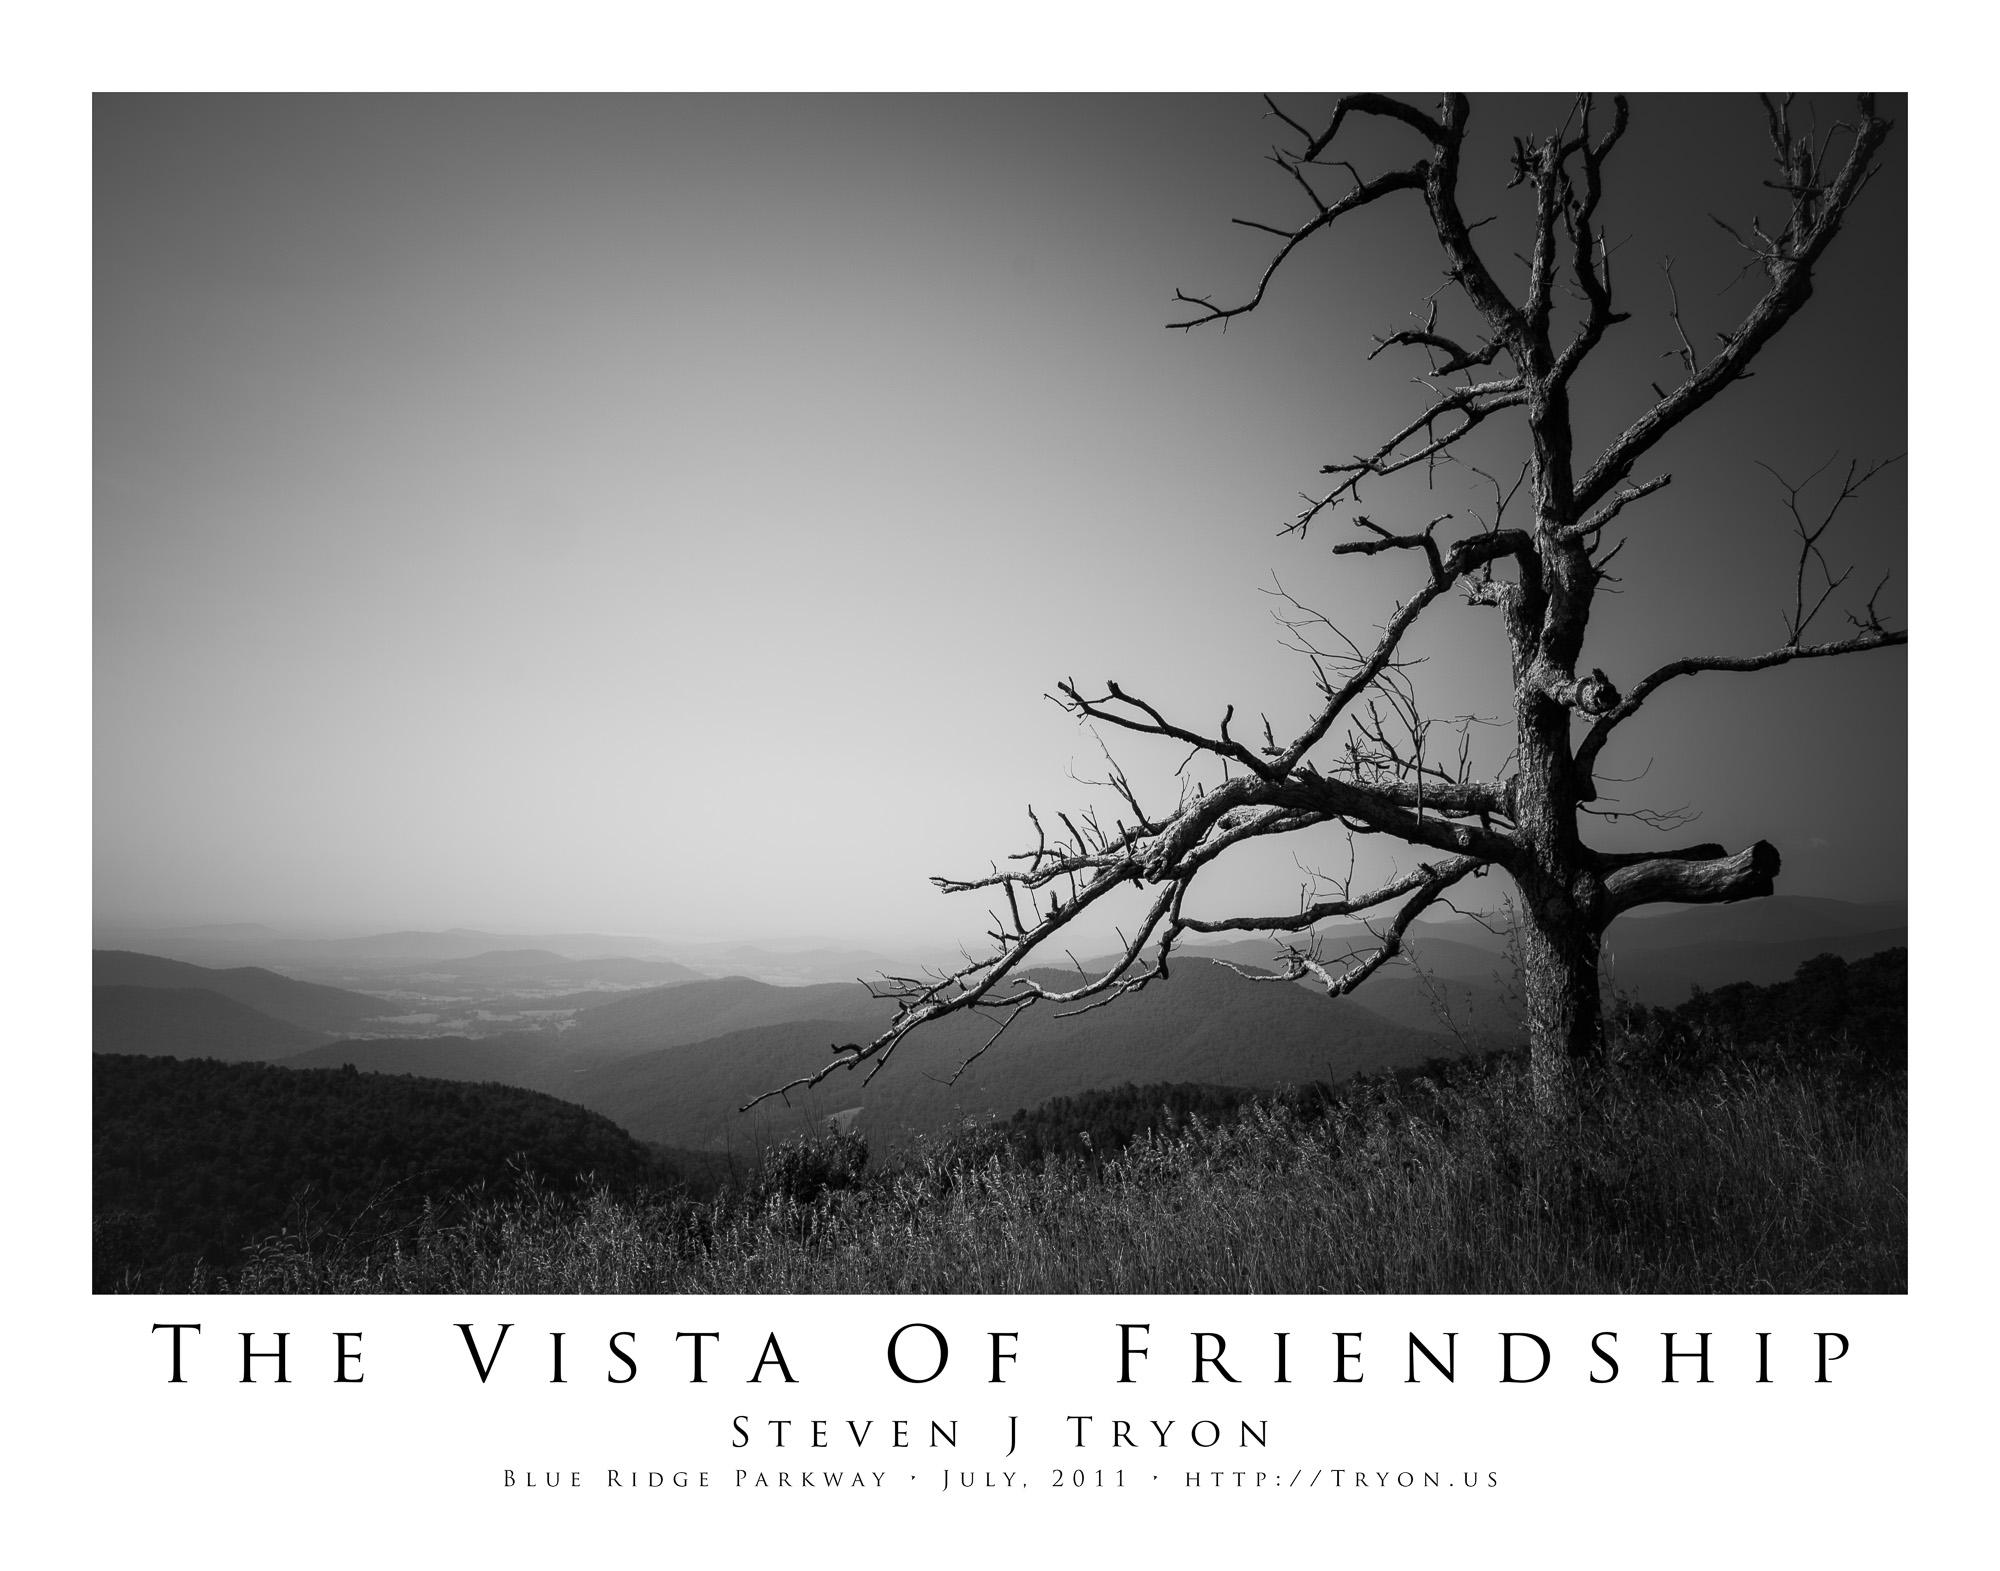 The Vista Of Friendship